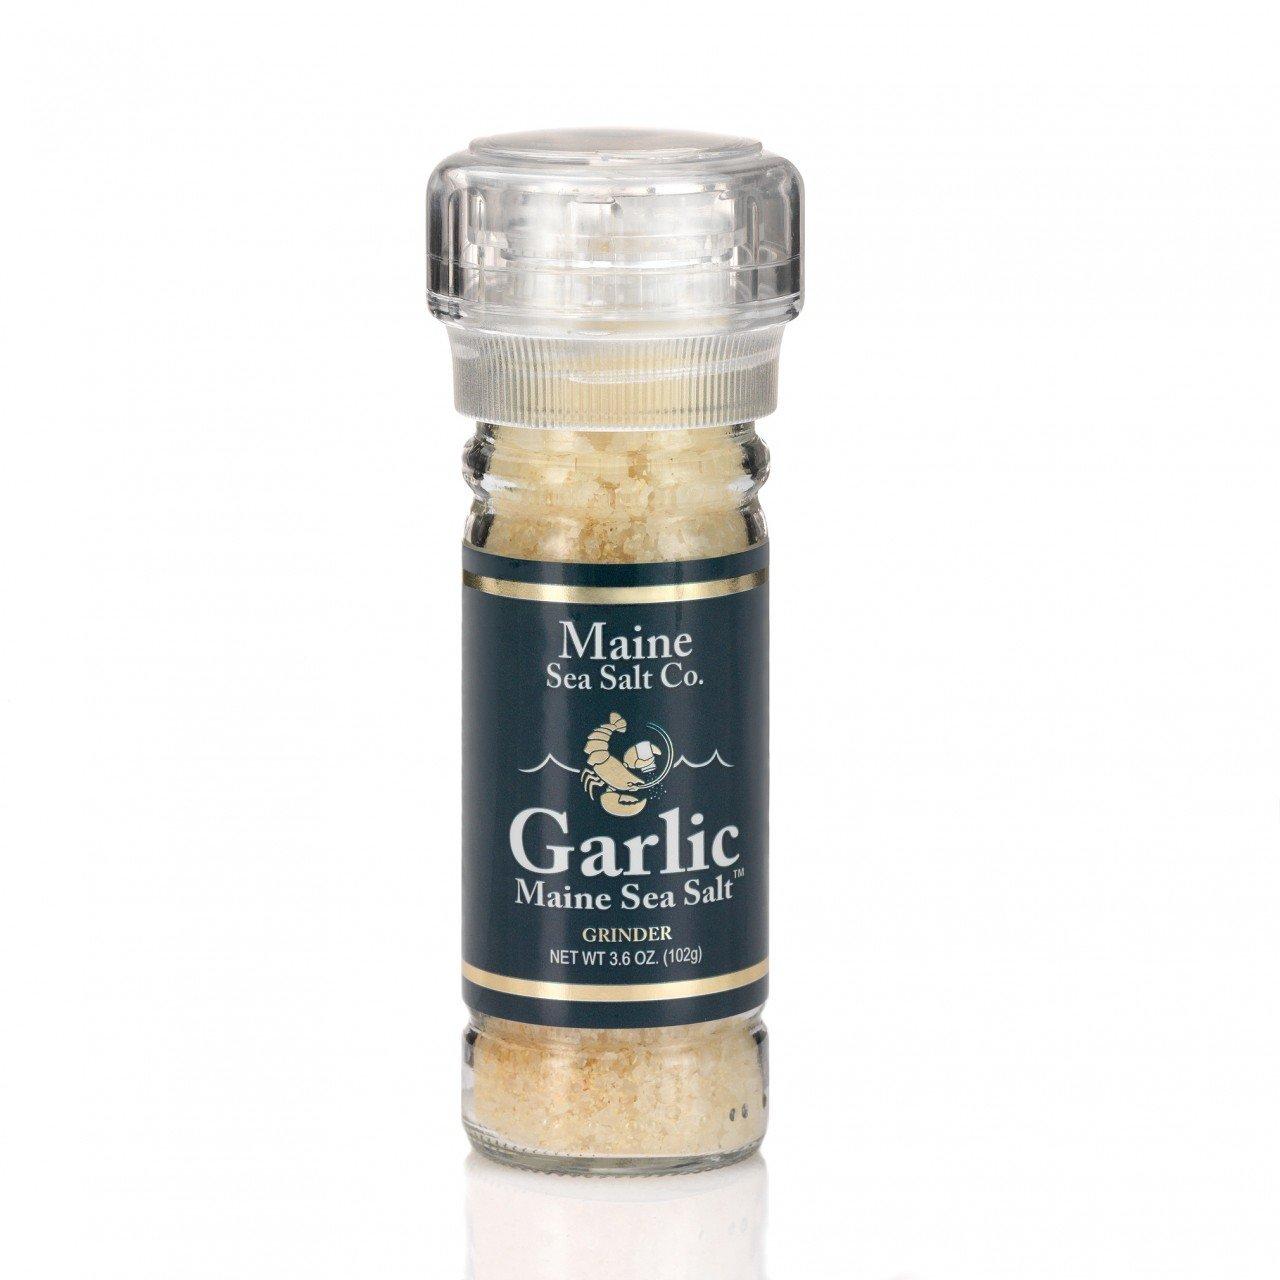 Maine Sea Salt - Garlic Sea Salt and Grinder - 3.6 Ounce